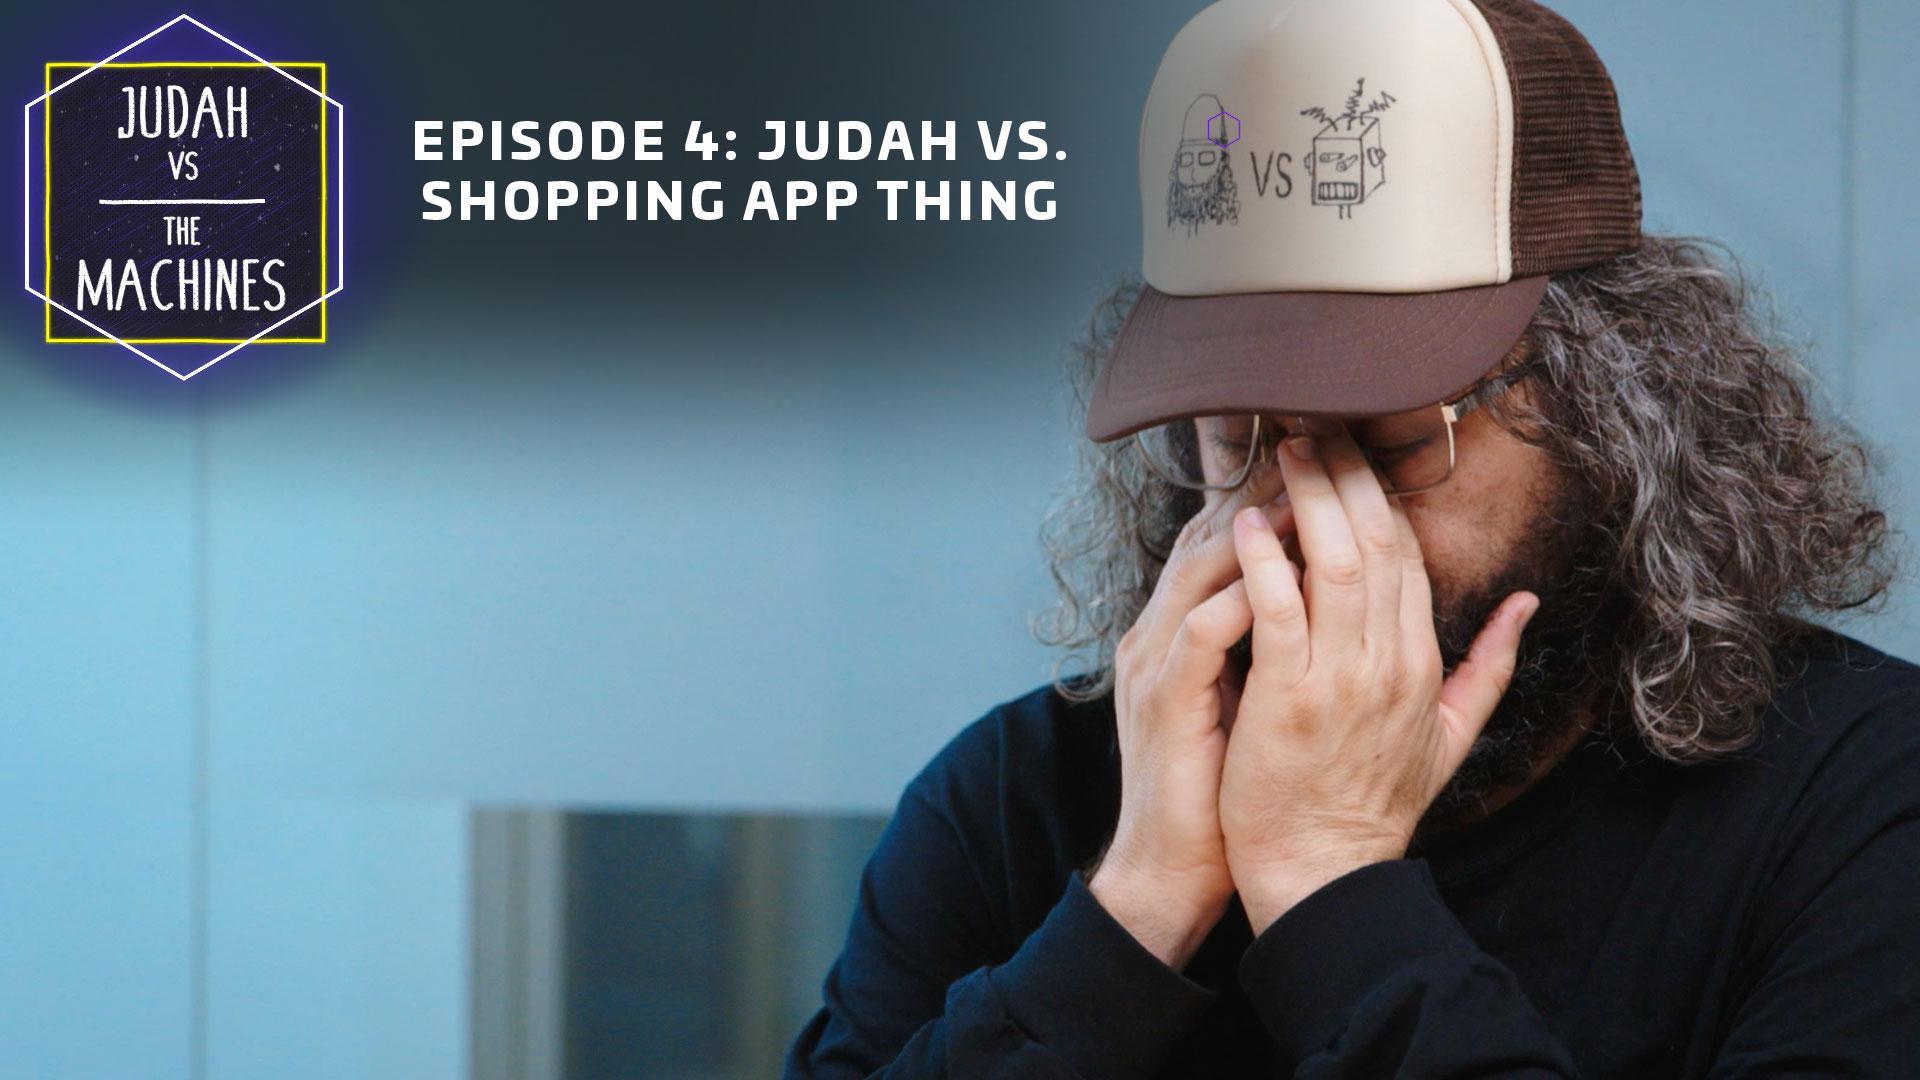 Judah vs shopping app thing